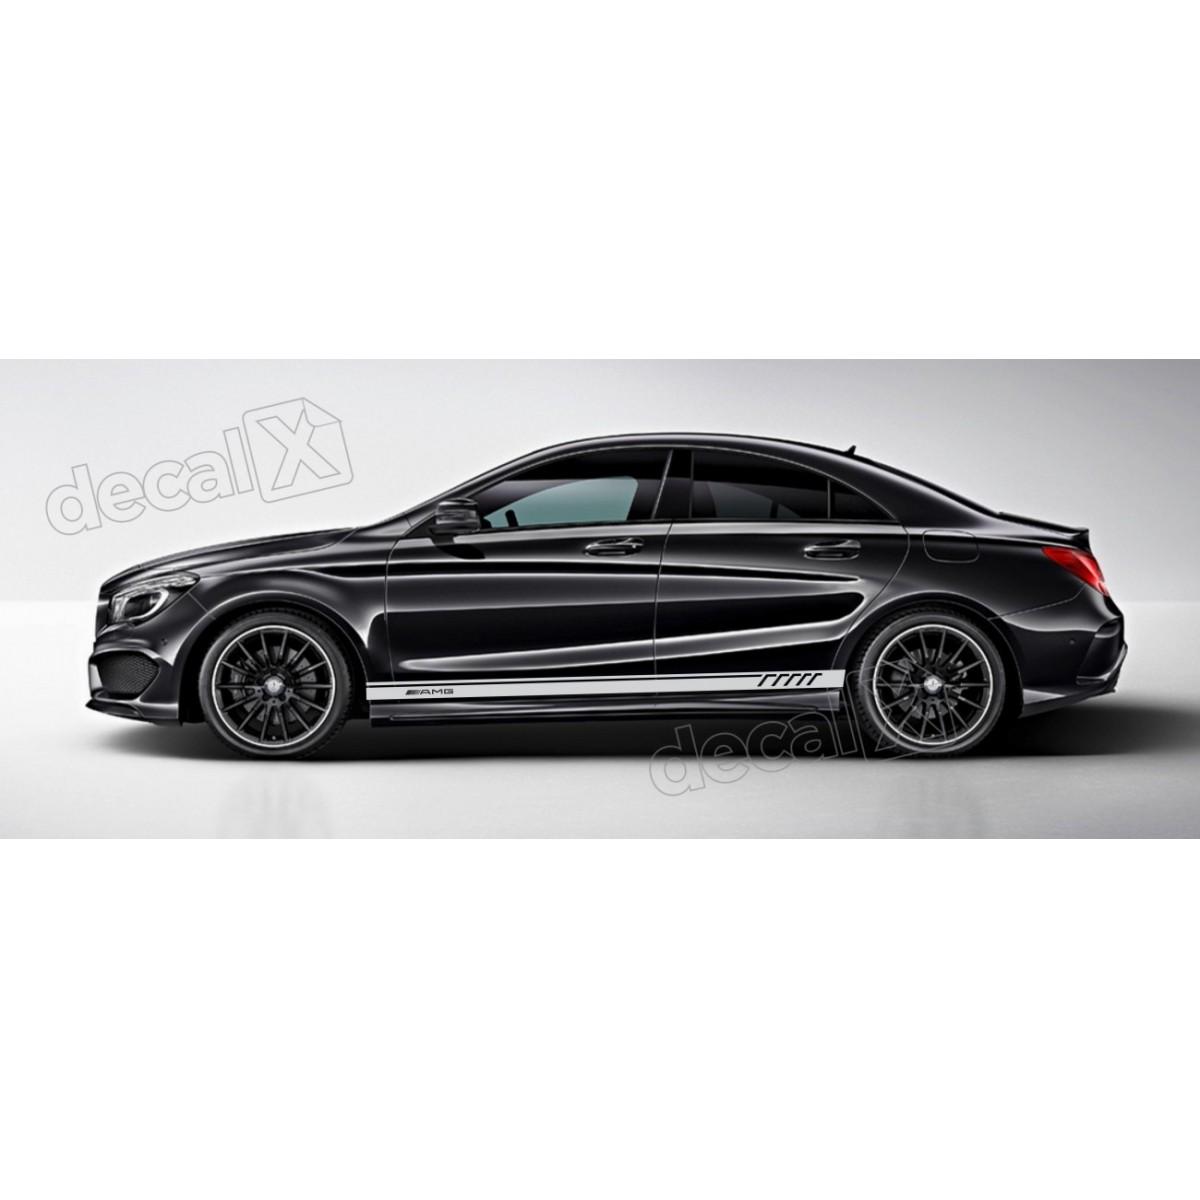 Adesivo Faixa Lateral Mercedes 3m A27